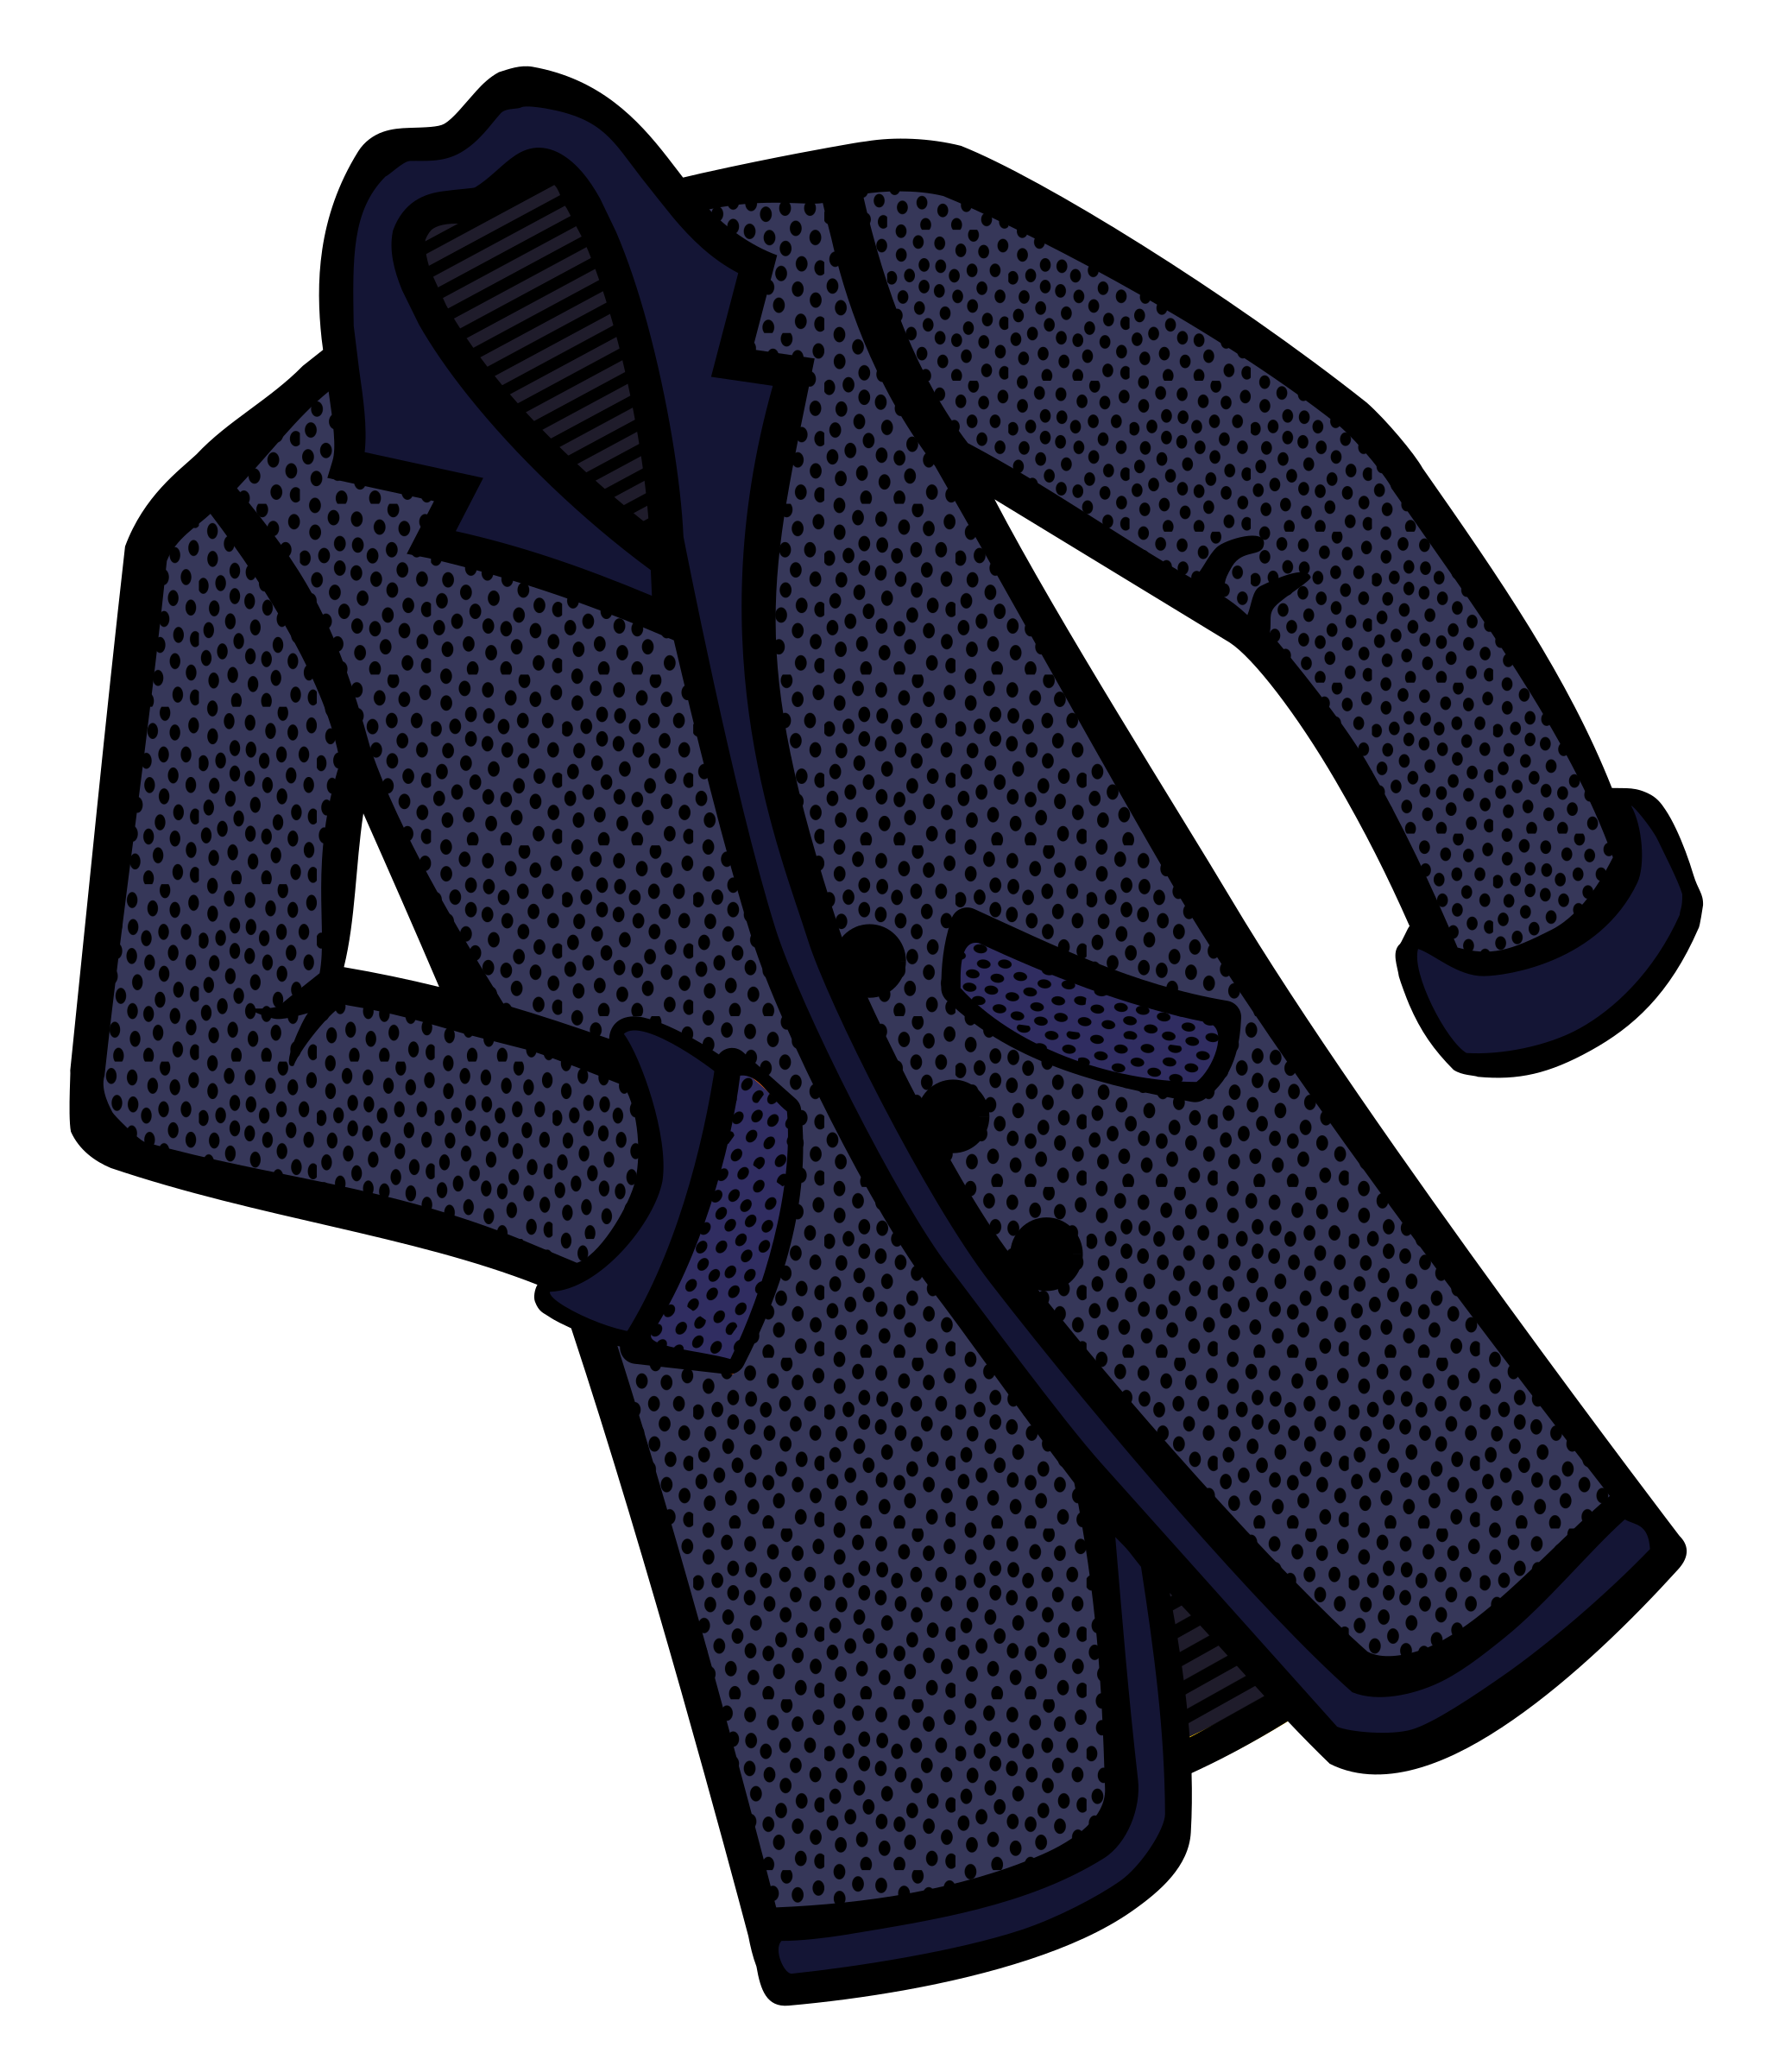 Coloured big image png. Gloves clipart coat